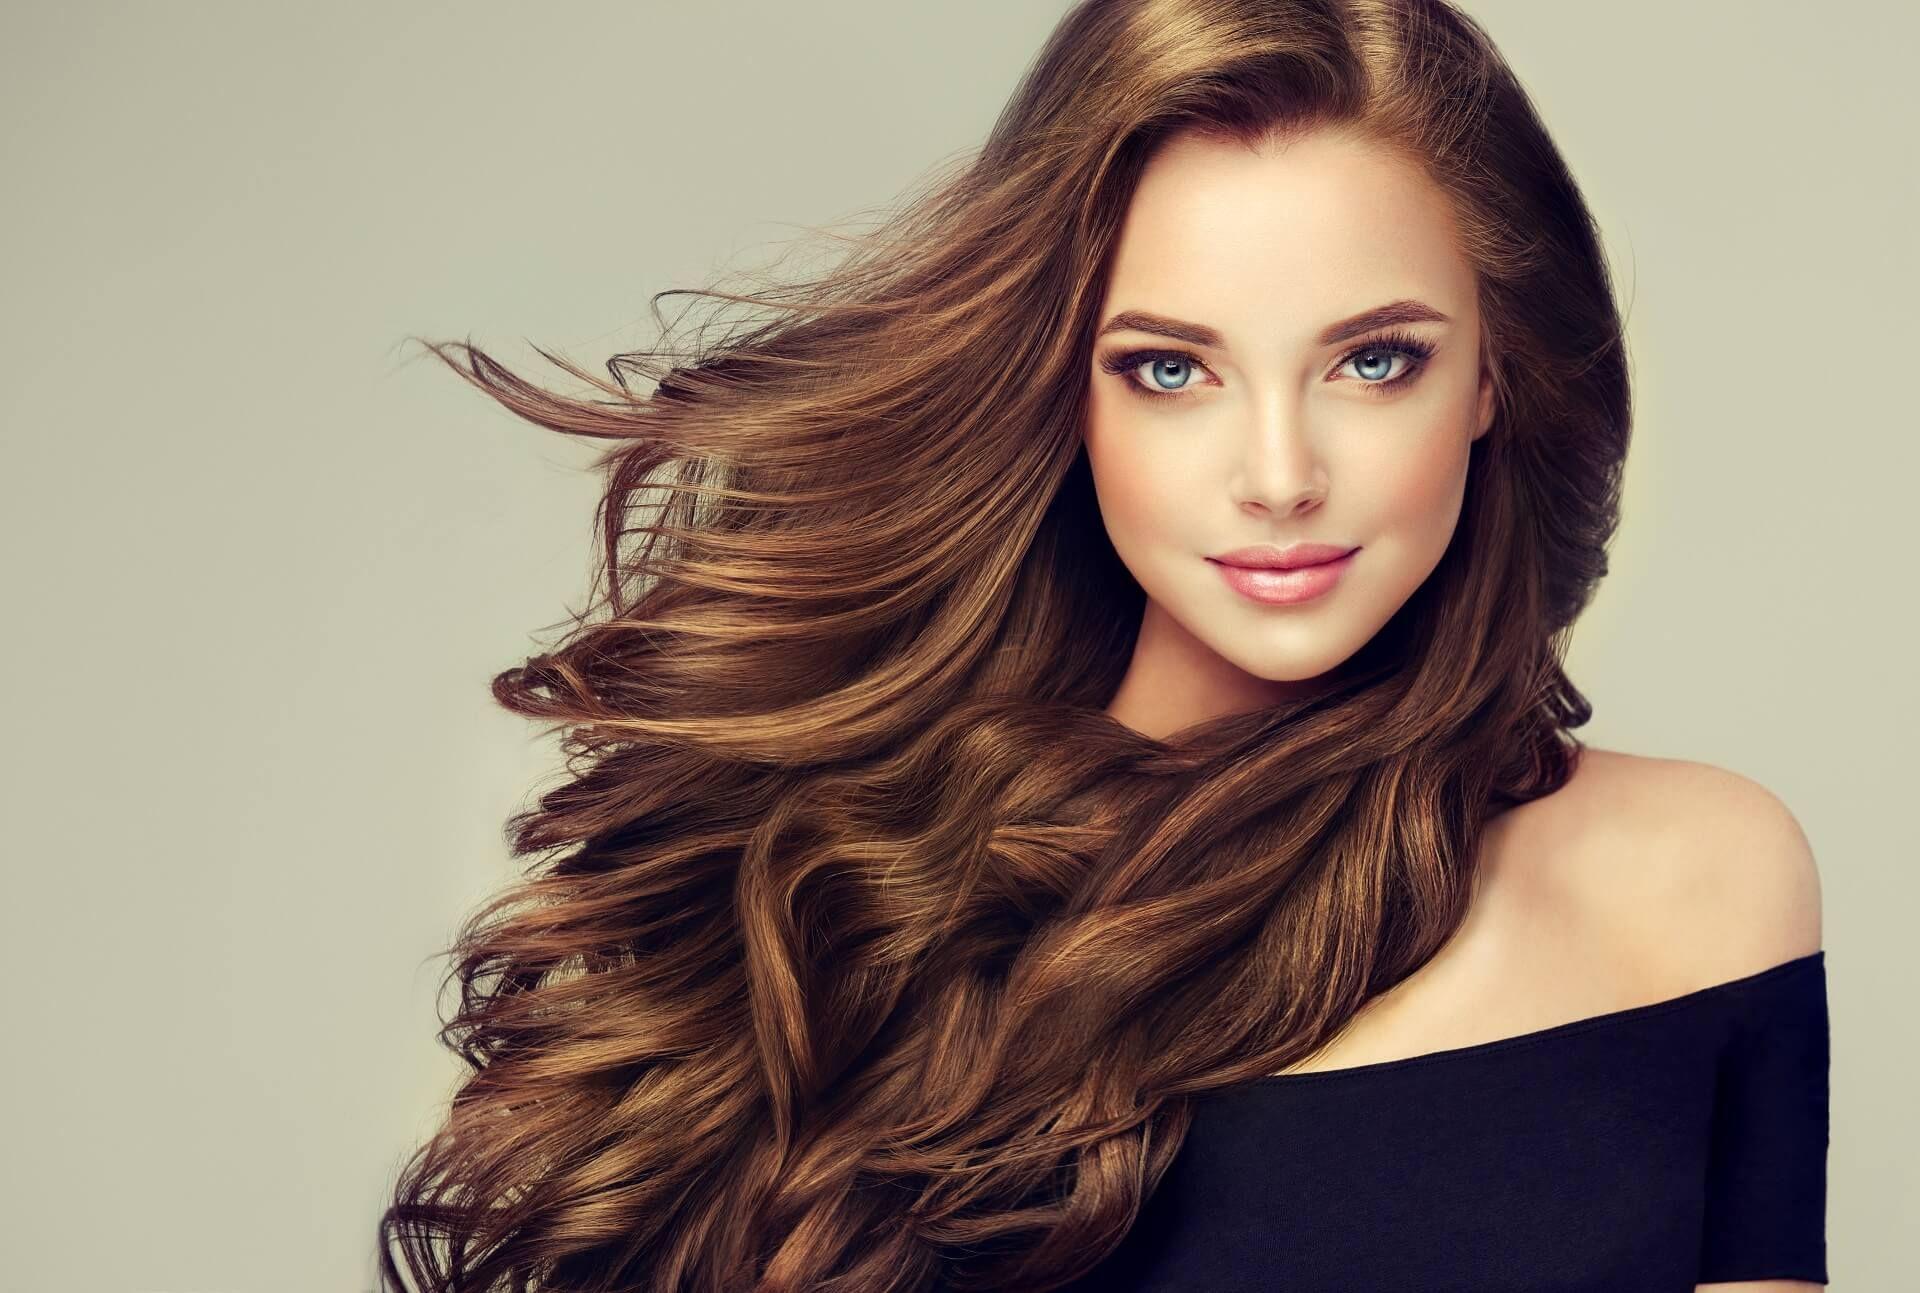 Was Tun Gegen Trockene Haare Trockene Haare Der Ratgeber